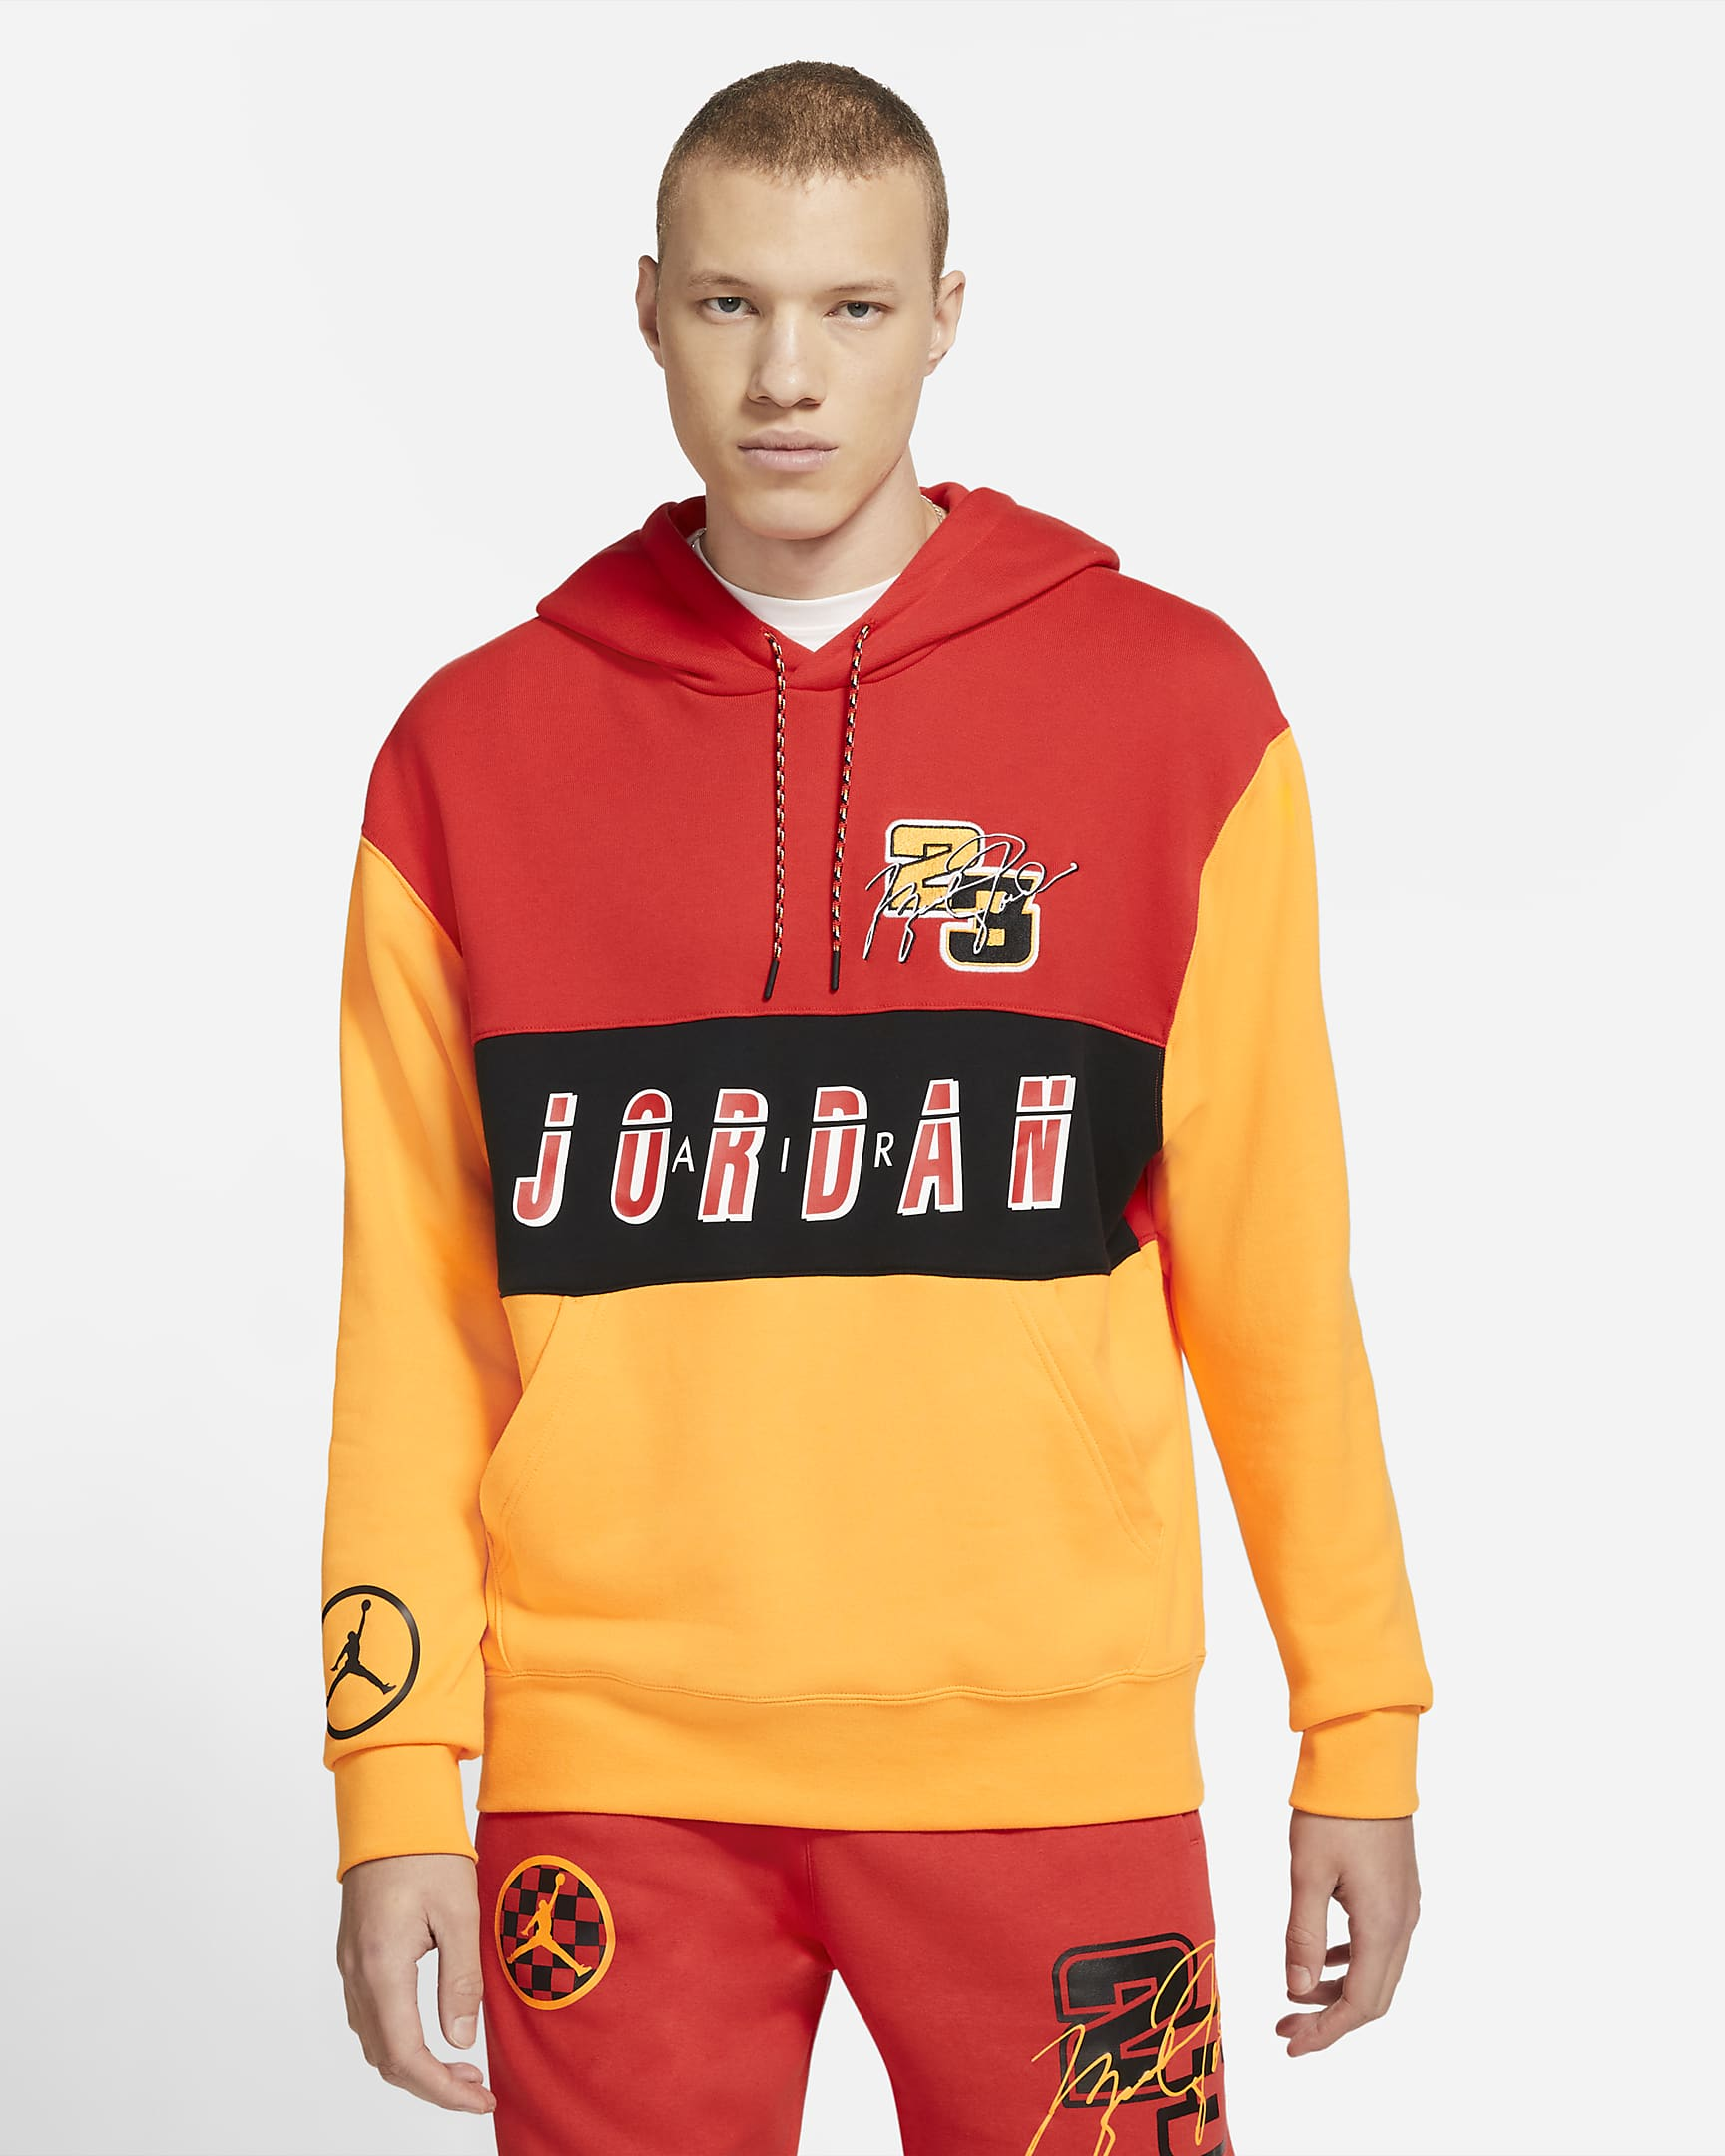 jordan-sport-dna-mens-pullover-hoodie-rMj8Rw